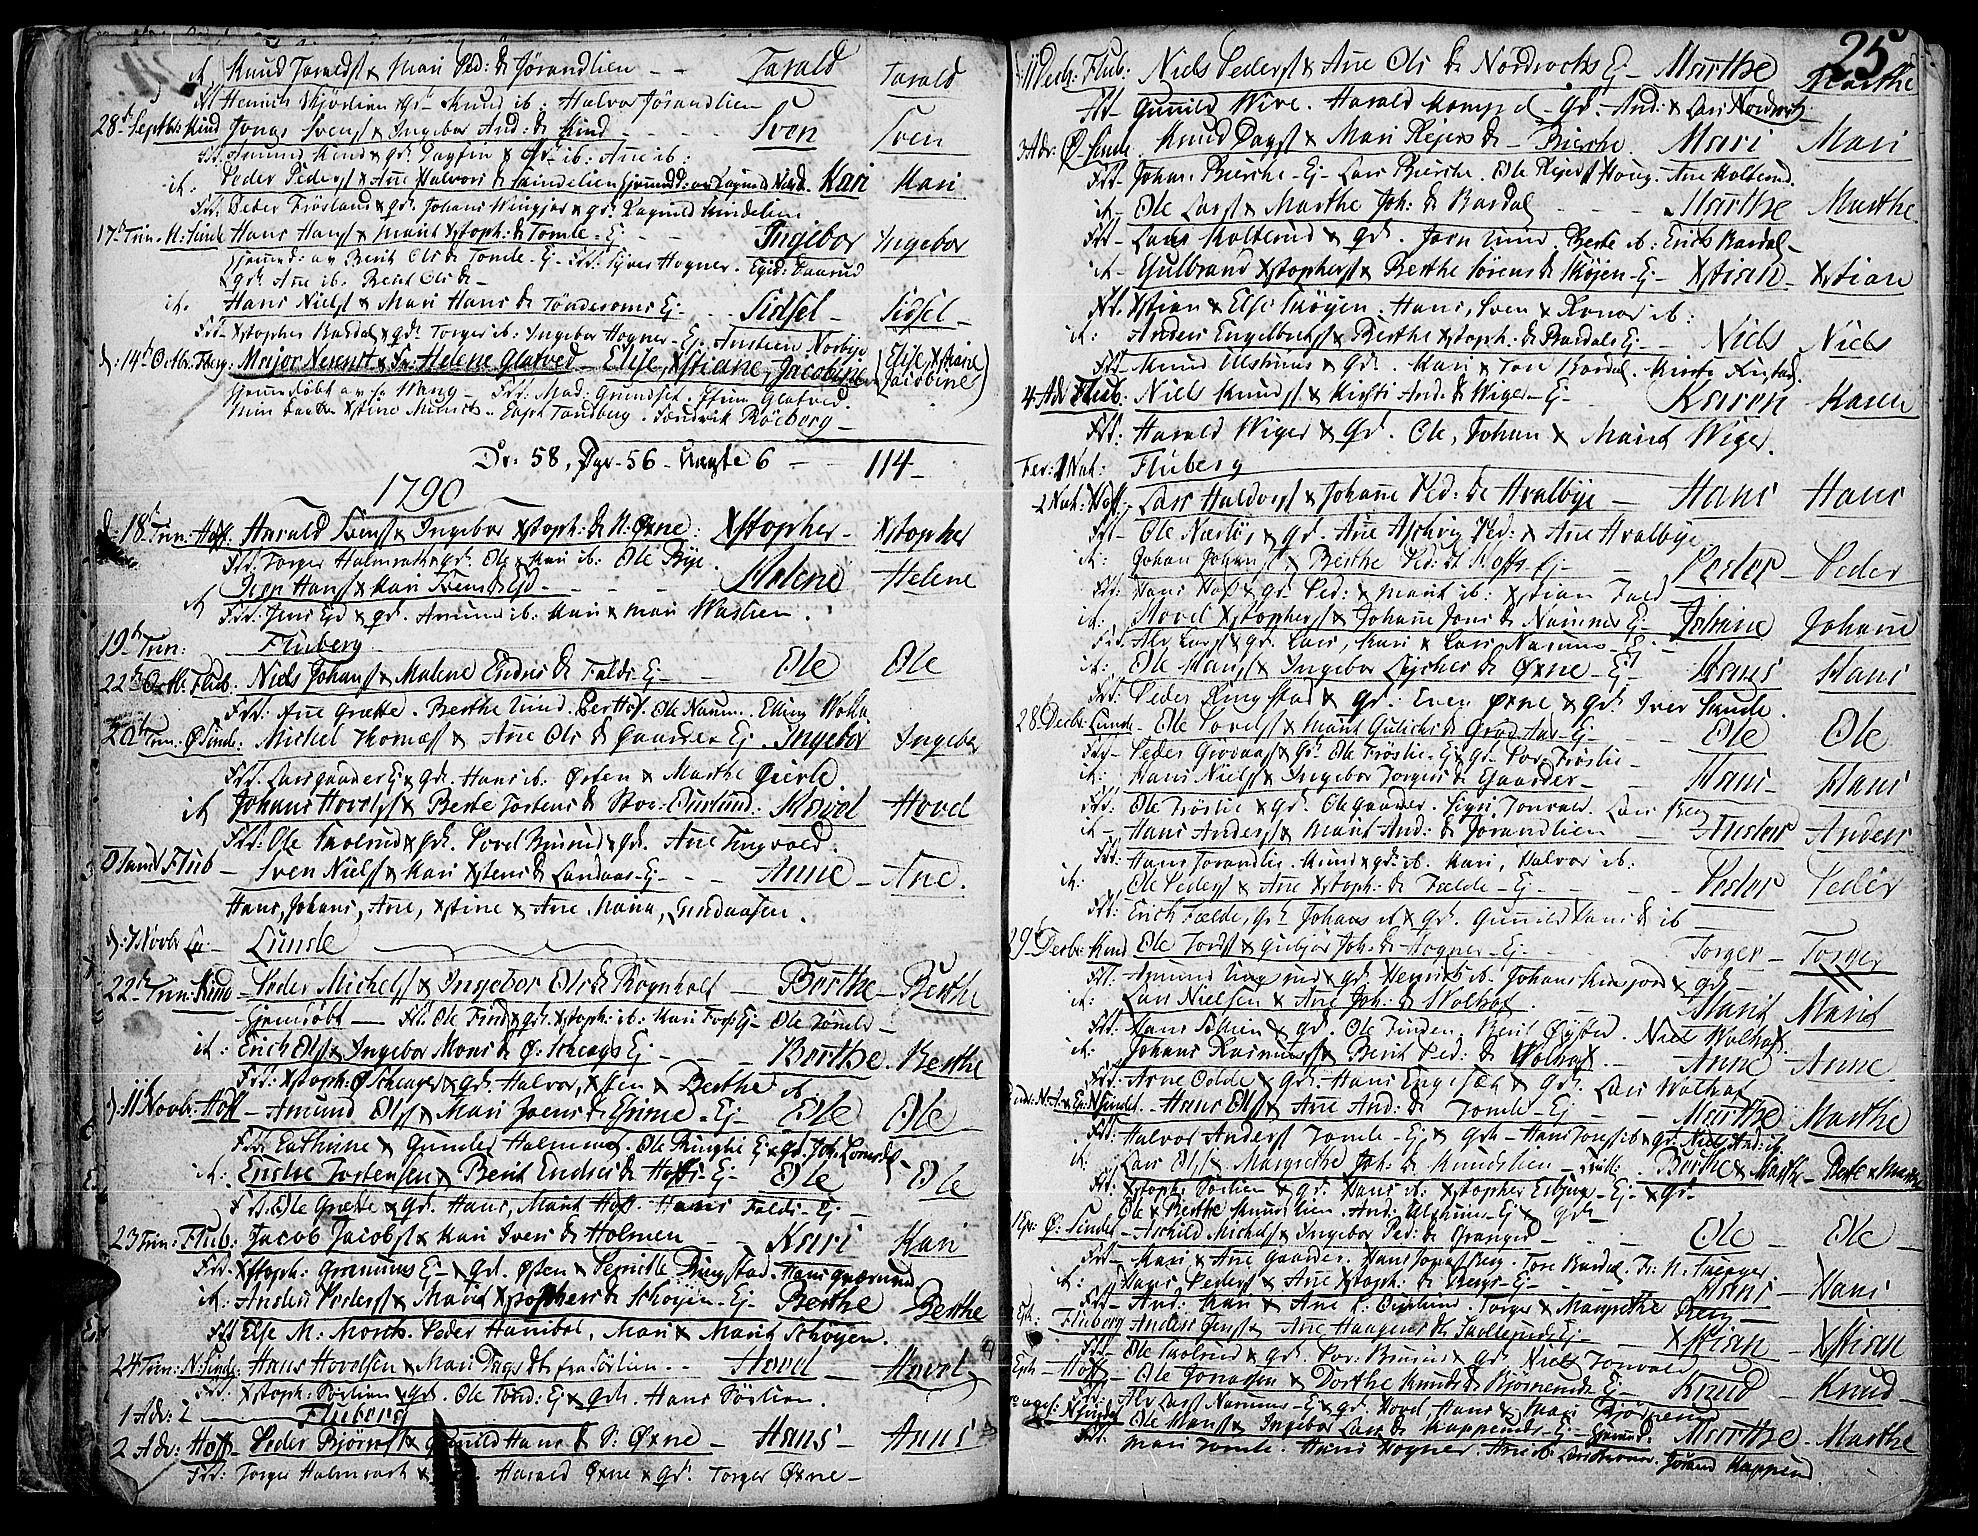 SAH, Land prestekontor, Ministerialbok nr. 6, 1784-1813, s. 25